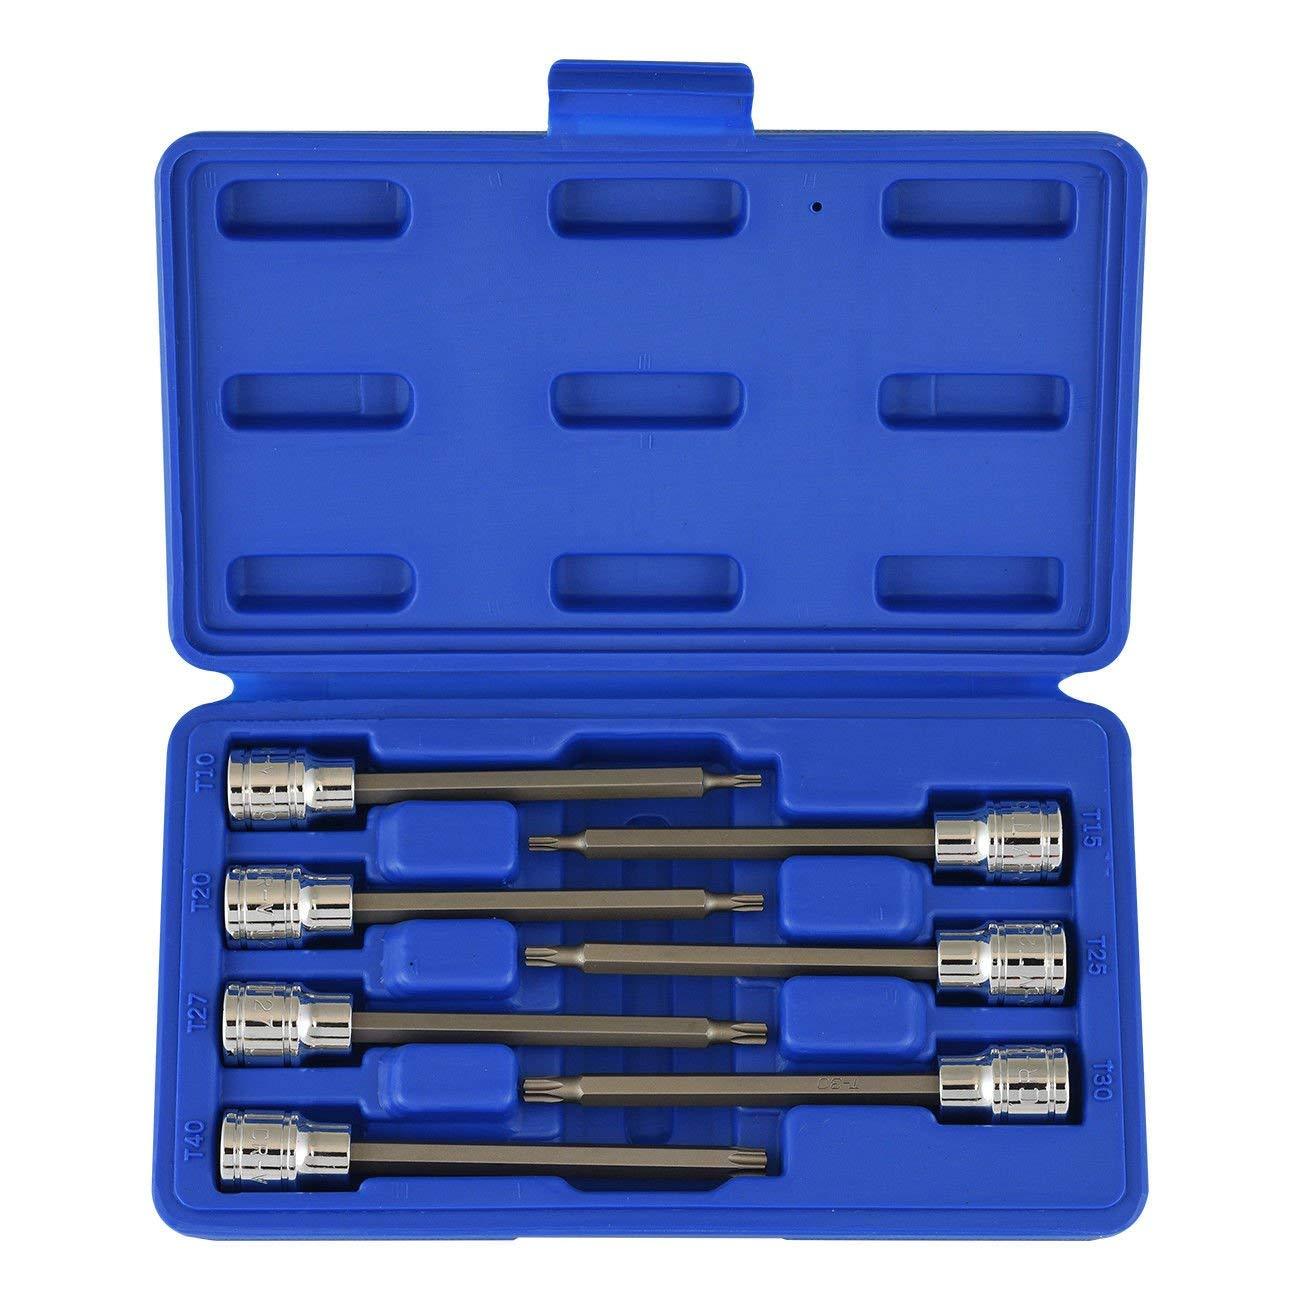 "ESKALEX>>3/8"" Drive Extra Long Torx Bit | 7pc Set 6pt Star CrV Deep Socket Security Kit And Premium S2 Steel Bits Chrome Vanadium Steel with a Mirror Polished Finish Sizes: T10, T15, T20, T25, T27"